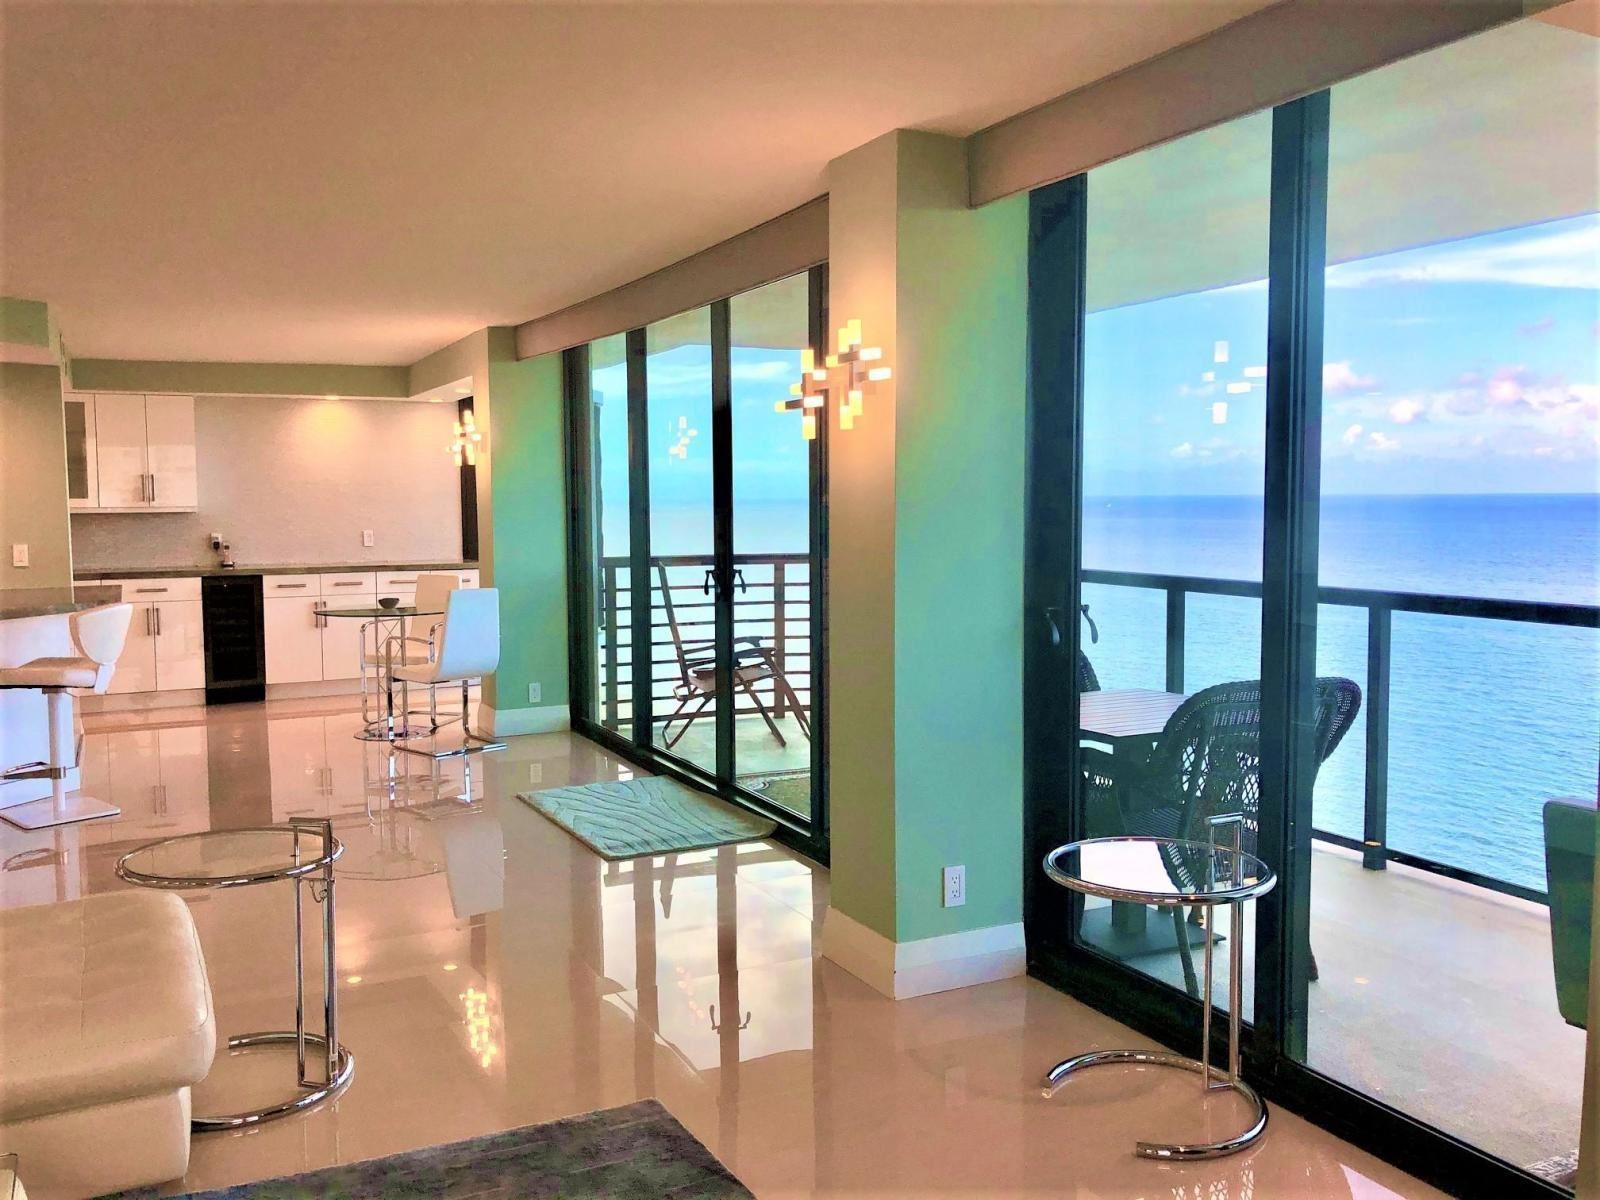 250 S Ocean Boulevard #17a, Boca Raton, FL 33432 - #: RX-10632864